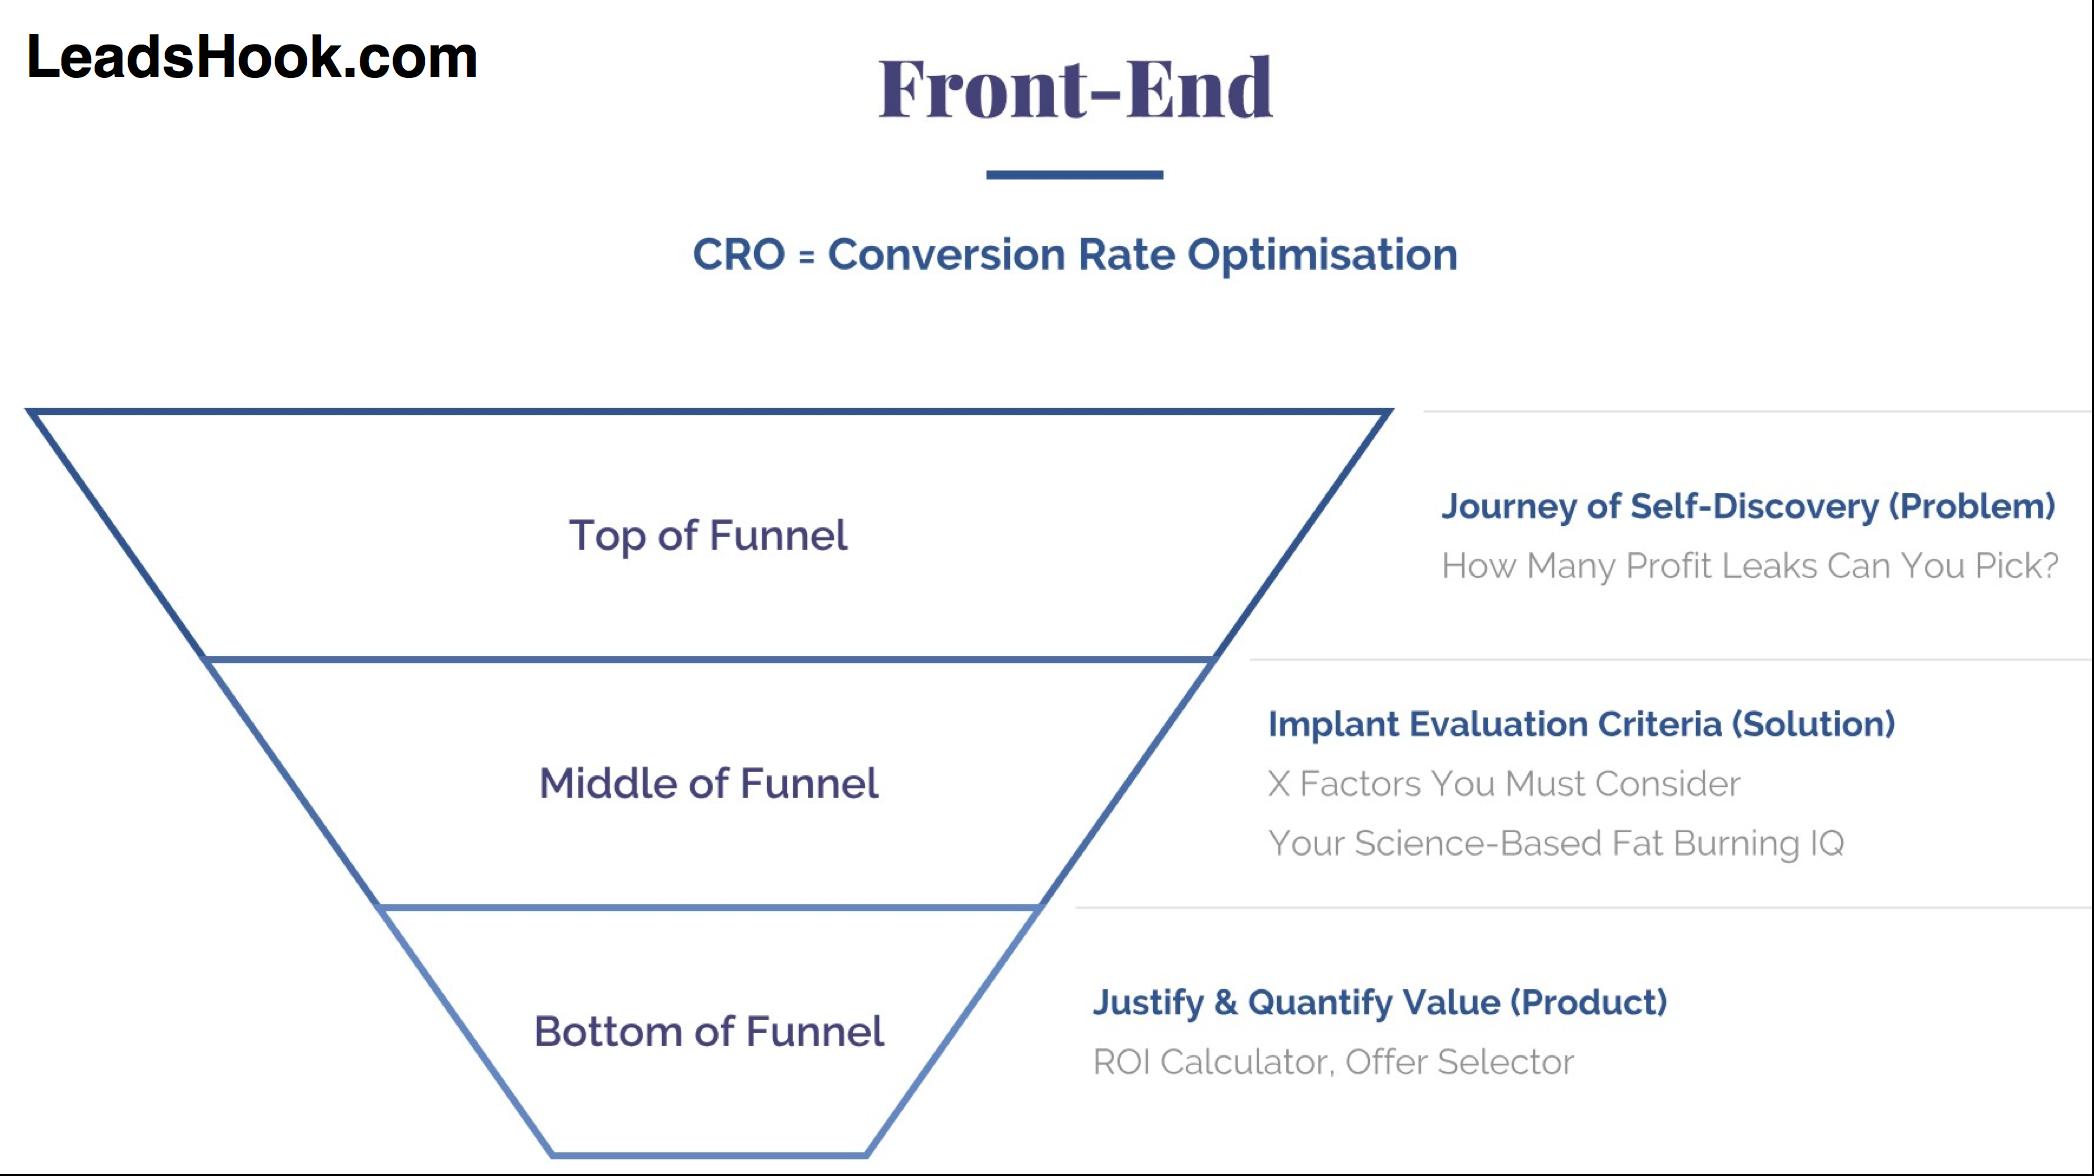 Marketing Frontend - Conversion Rate Optimisation